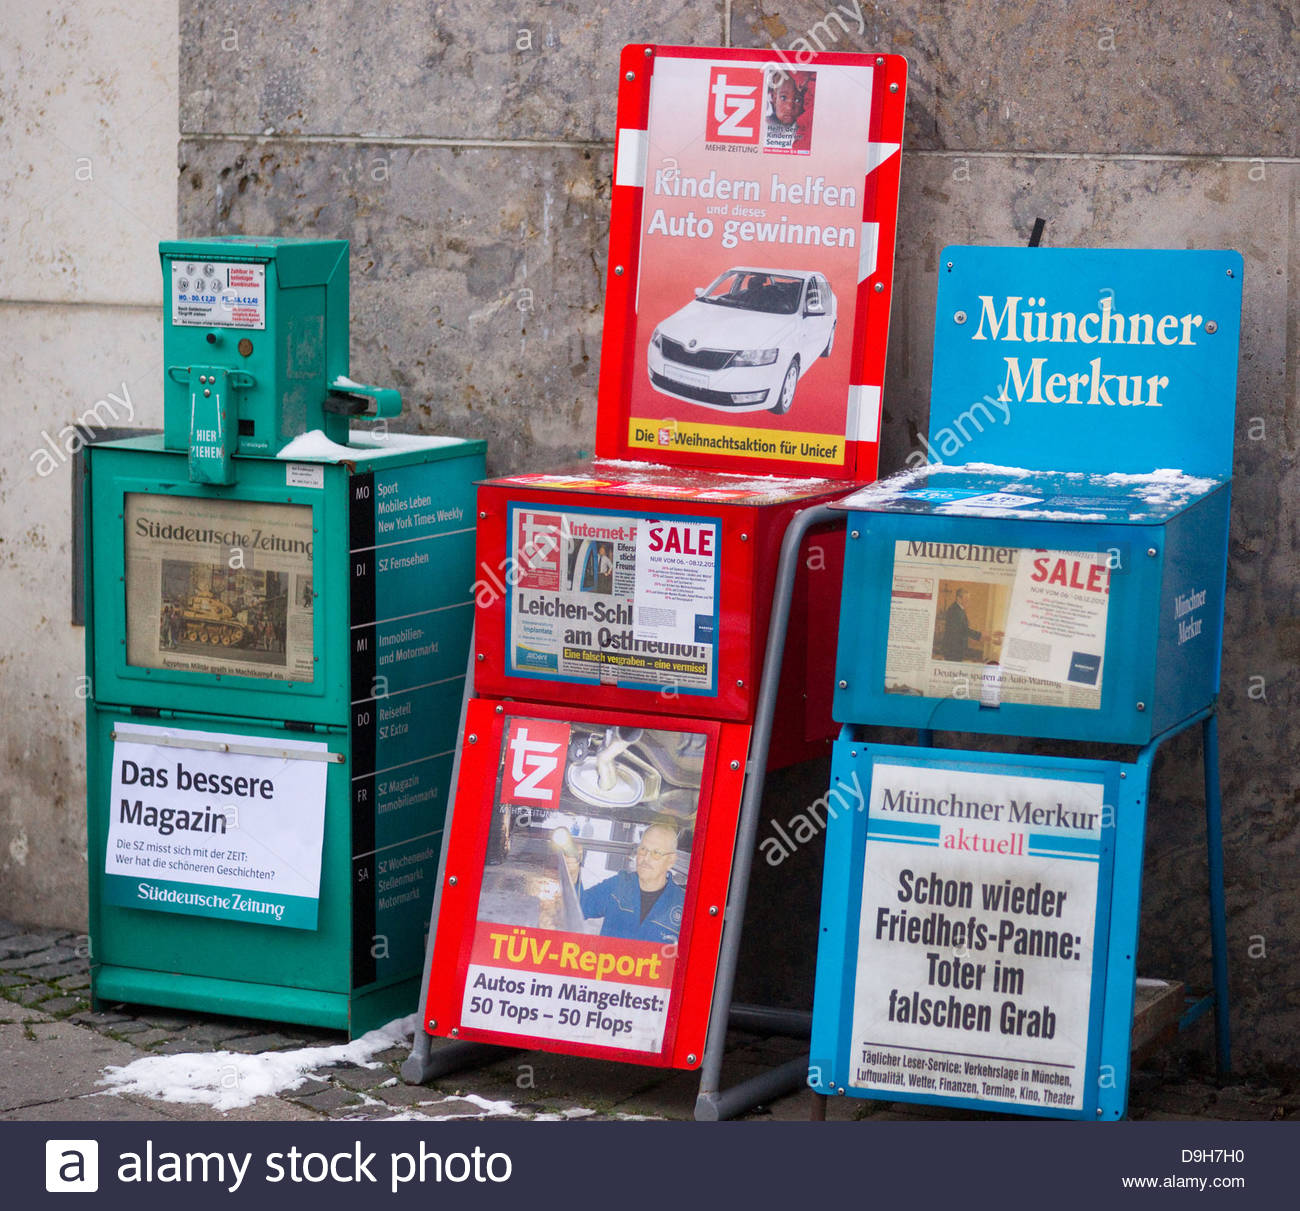 advertise advertisement communication daily dispenser display headline information news newspaper paper press publication - Stock Image